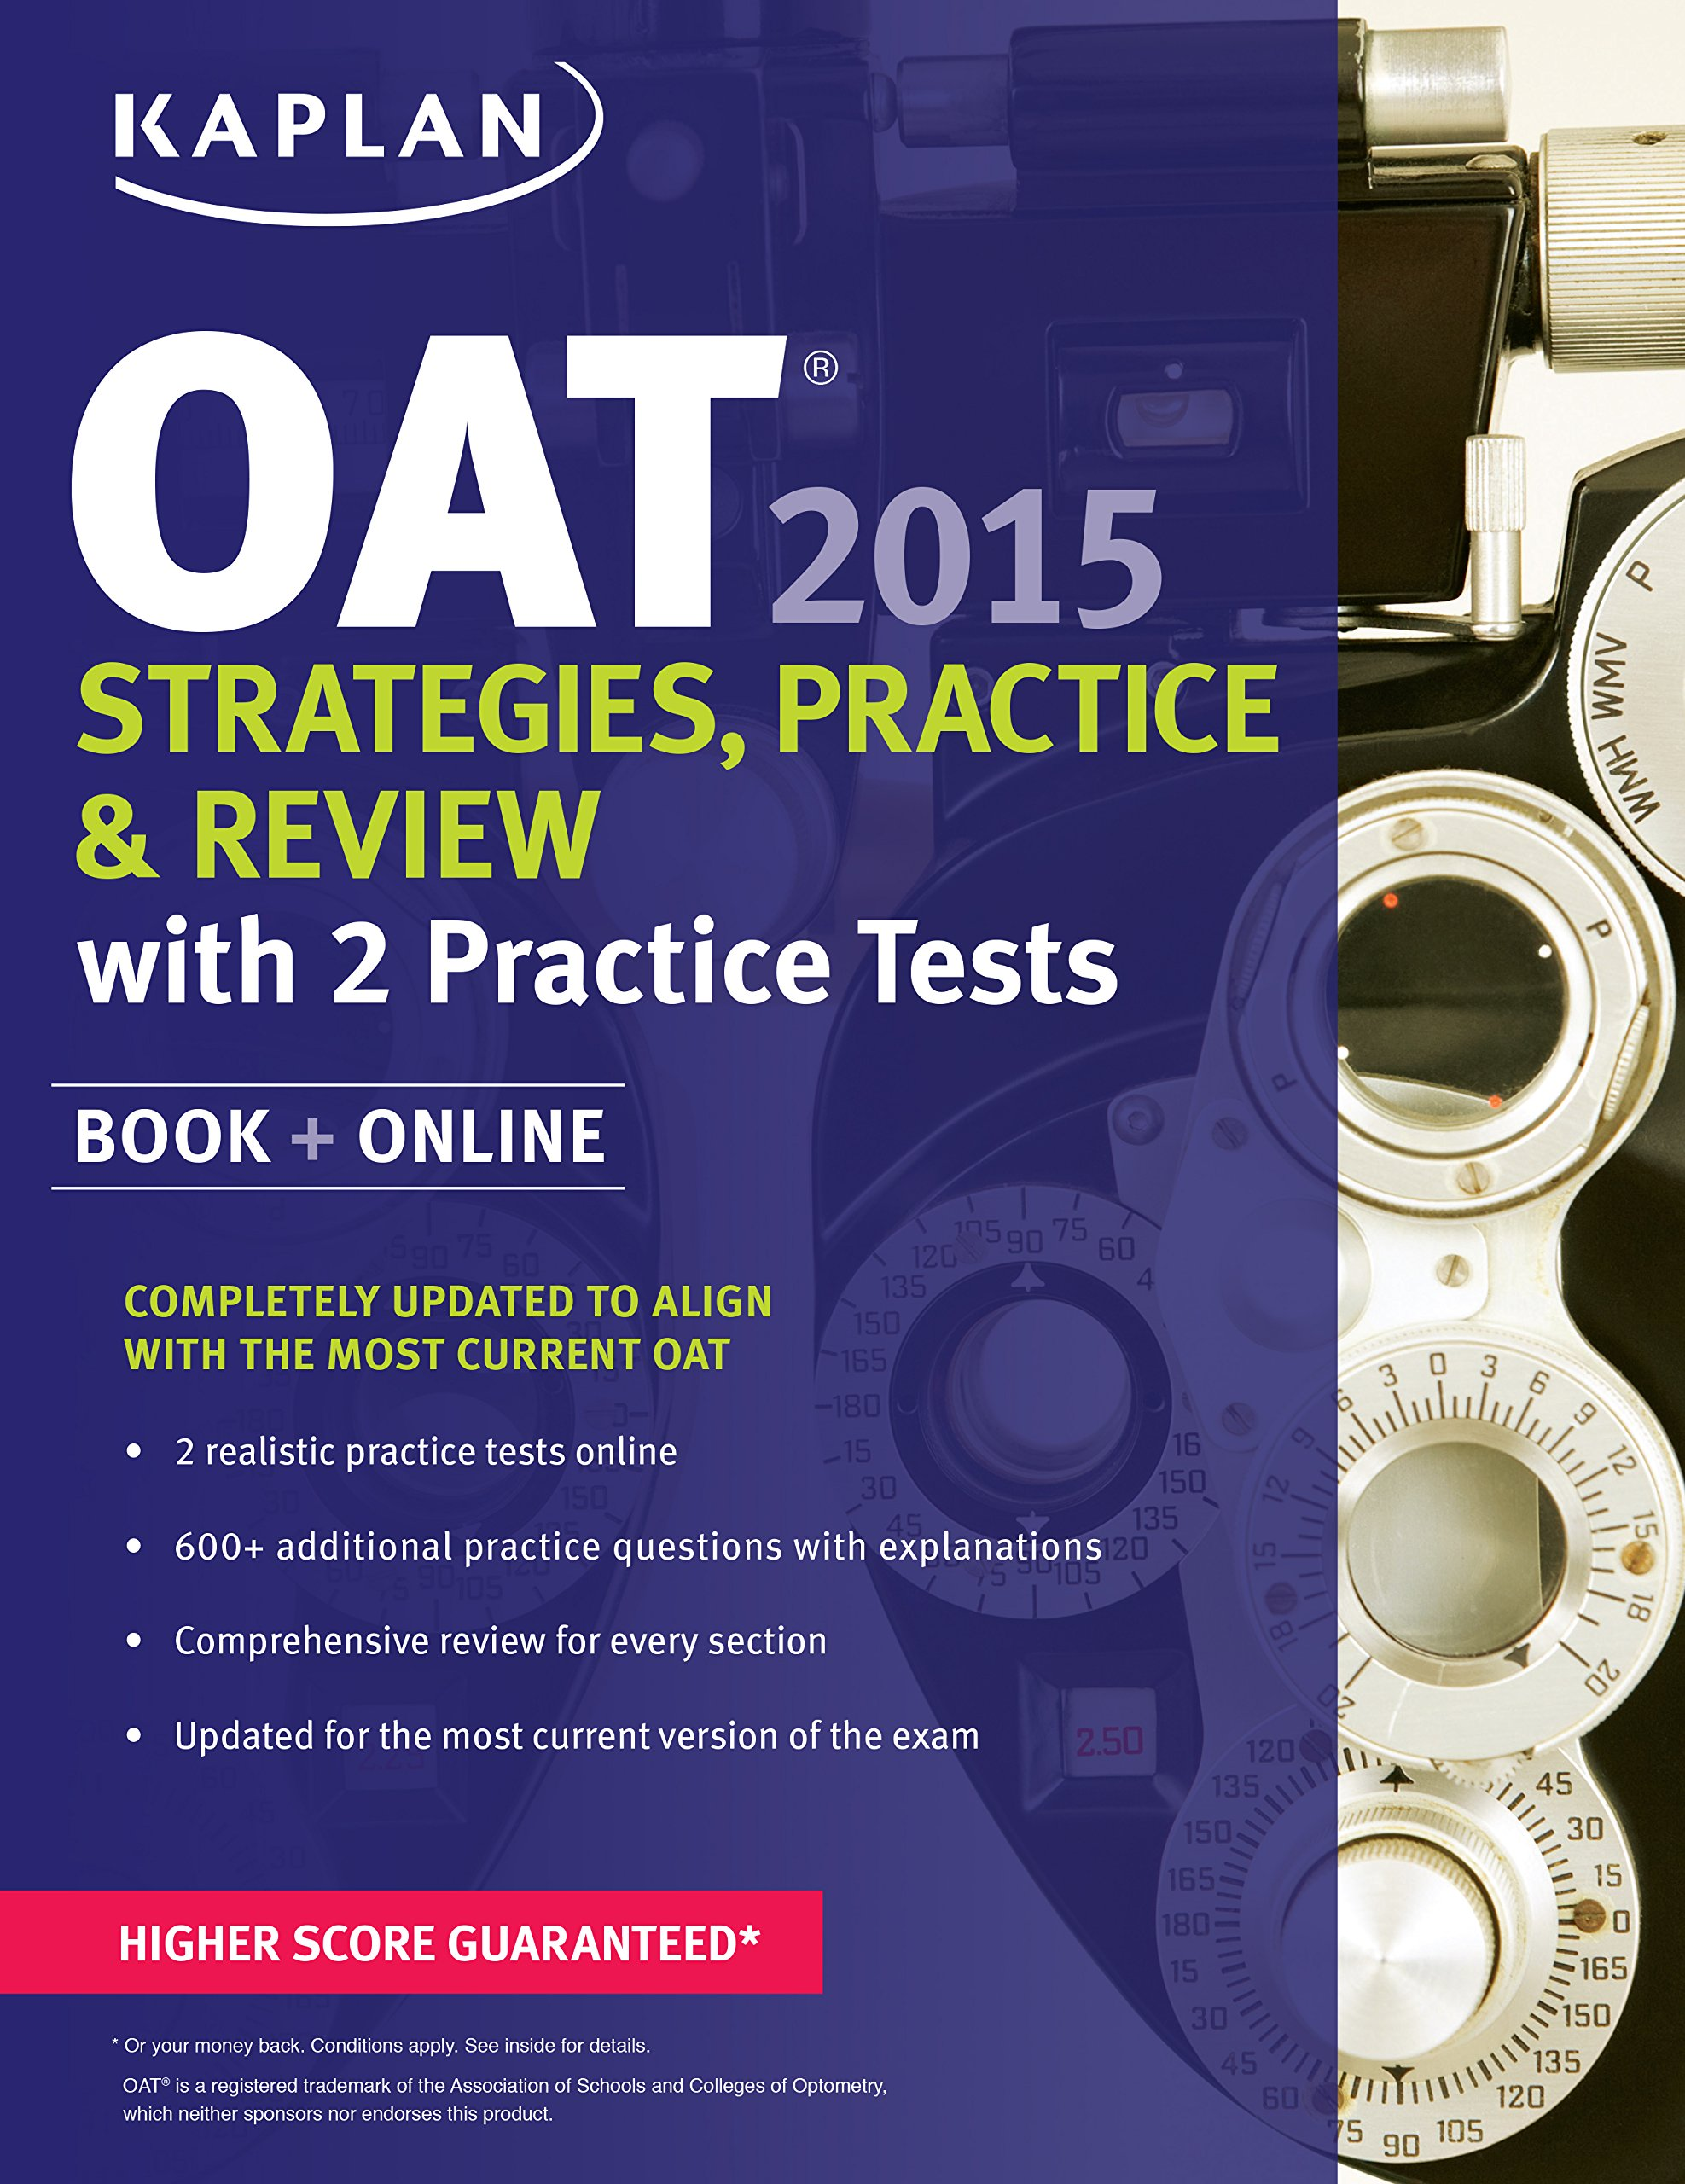 Kaplan OAT 2015 Strategies, Practice, and Review with 2 Practice Tests: Book + Online (Kaplan Test Prep)